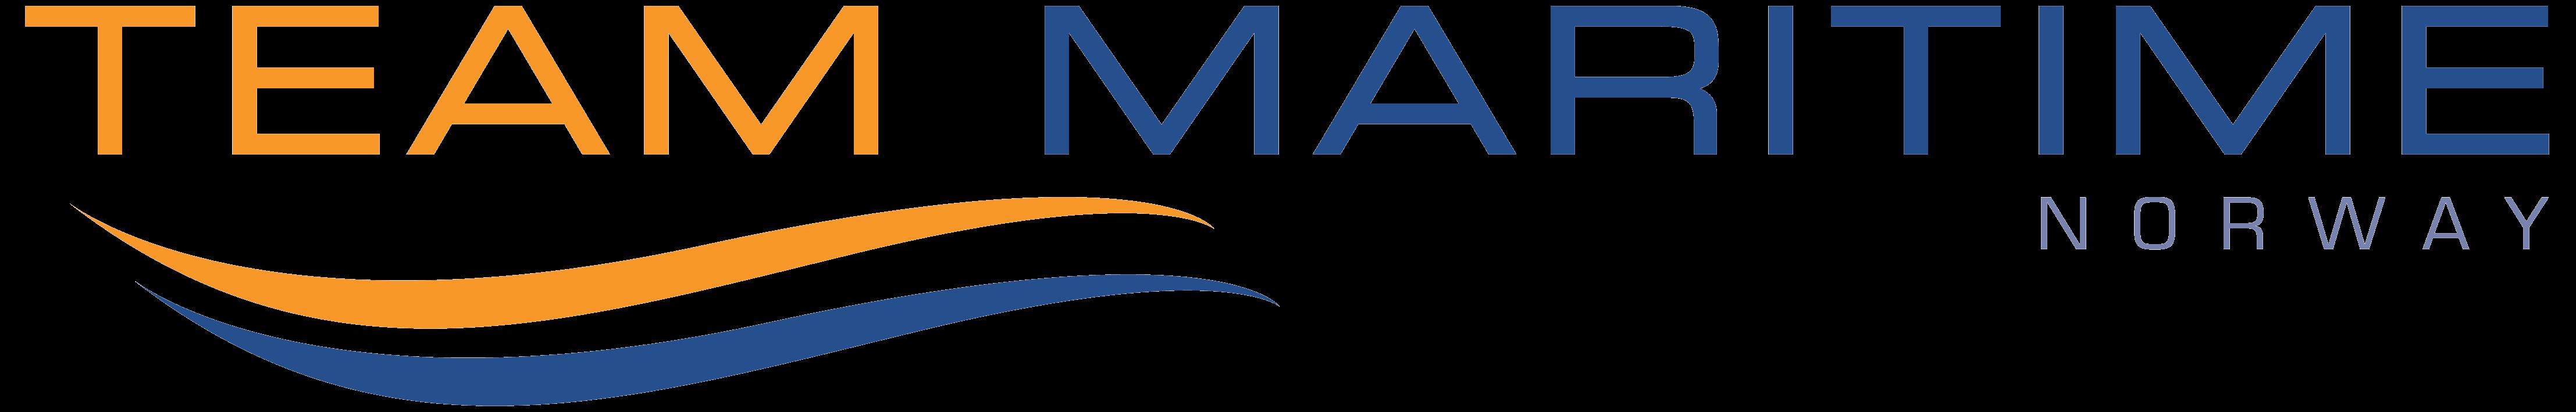 Team Maritime